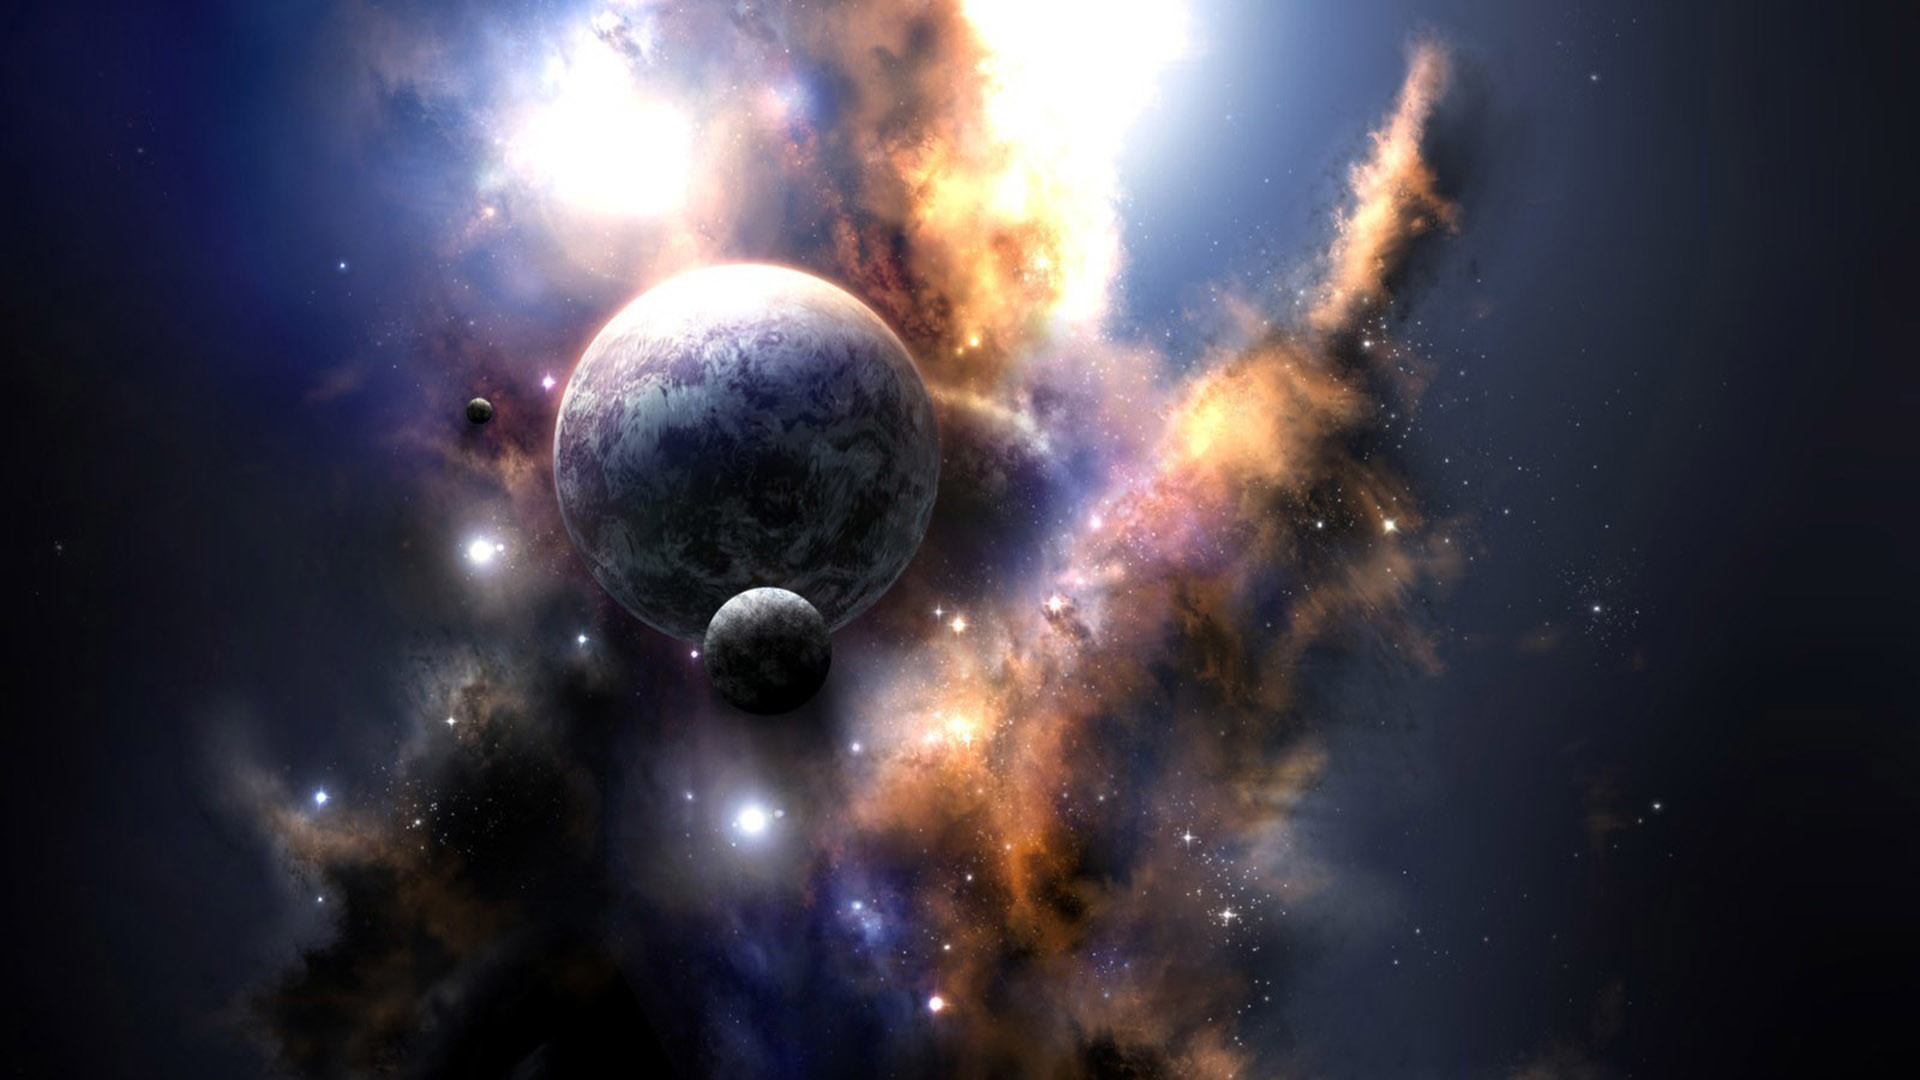 Image detail for -Fantasy, art, space, nebula, photo – 435249